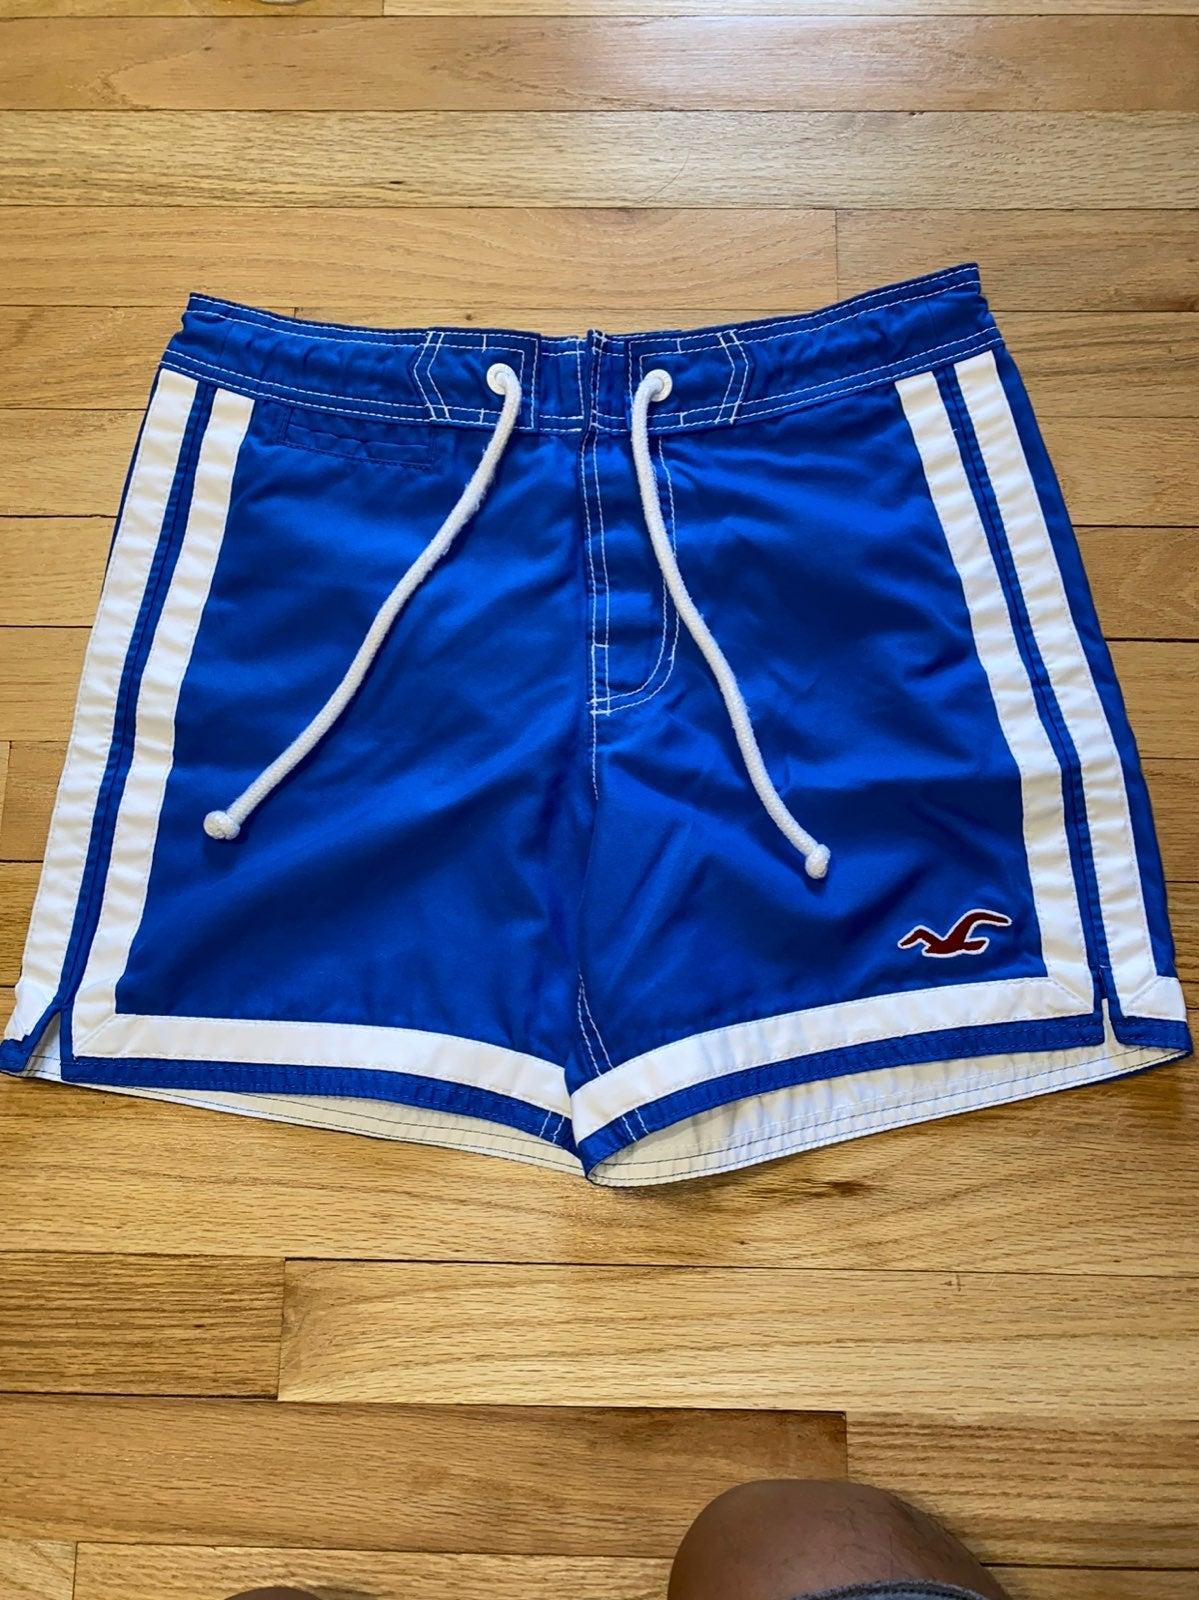 hollister swim shorts size Small